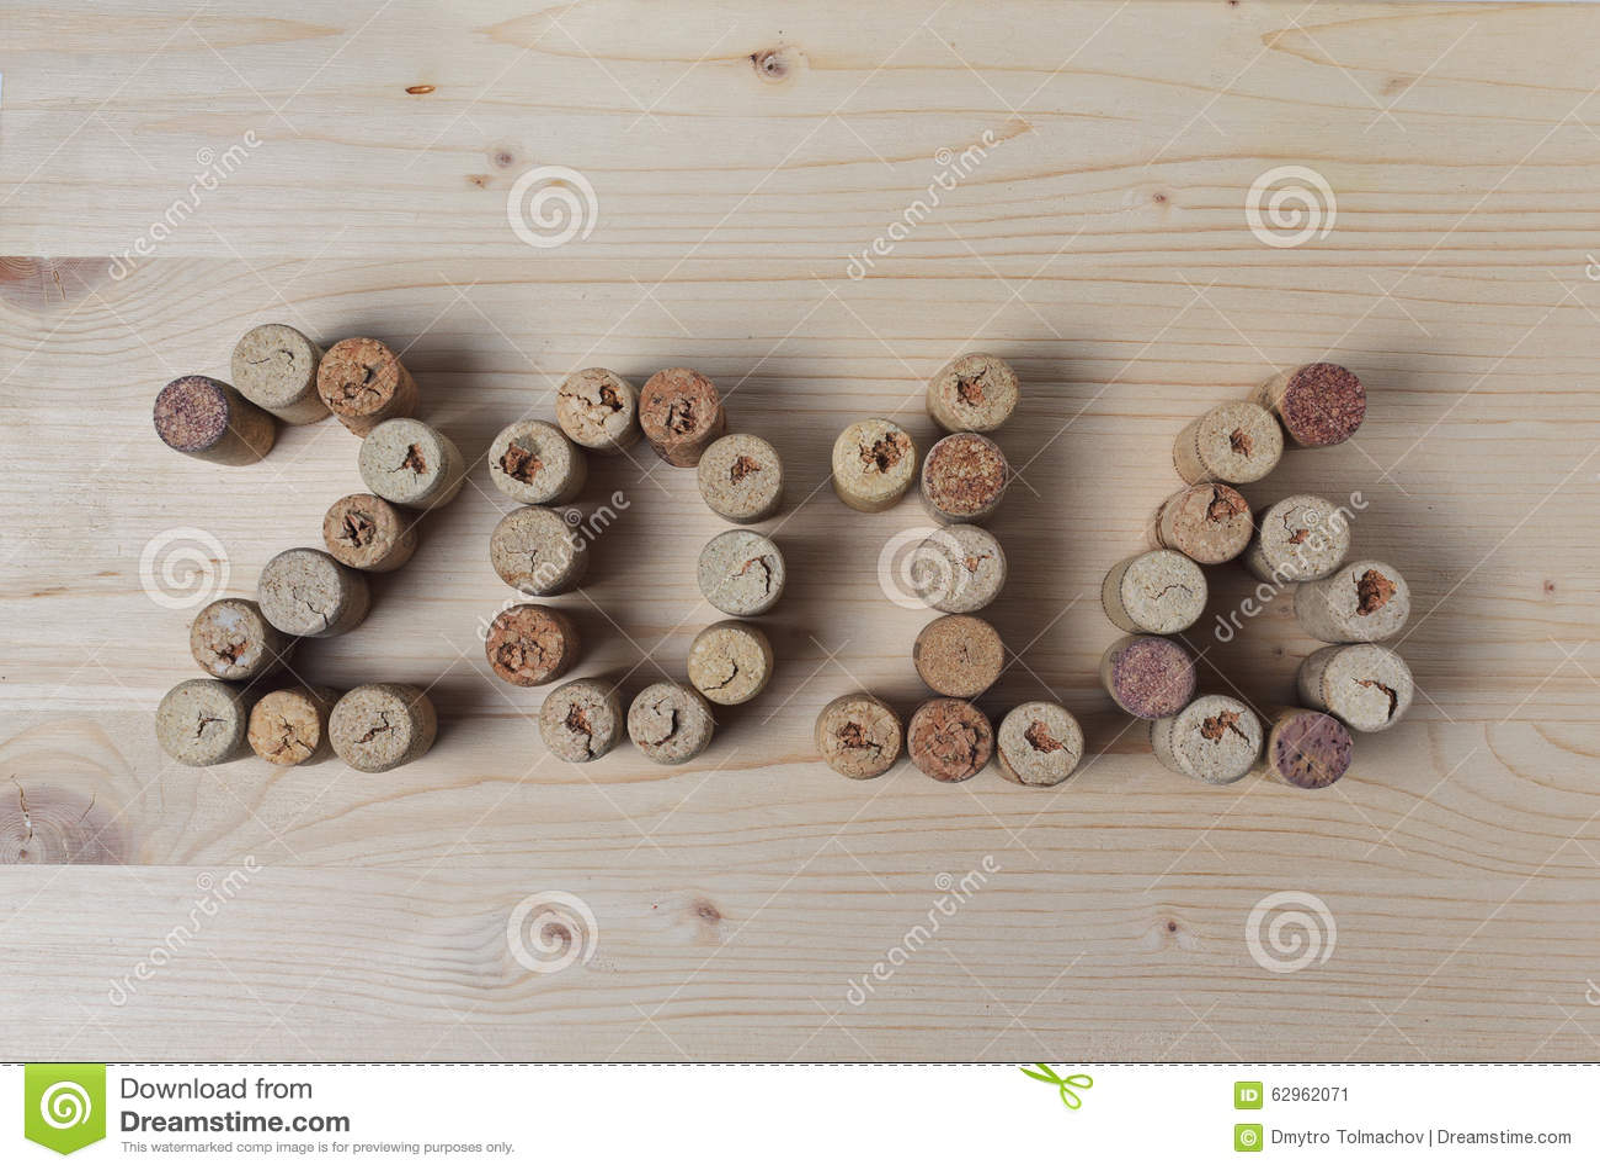 New year 2016 stock photo image 58693644 -  2016